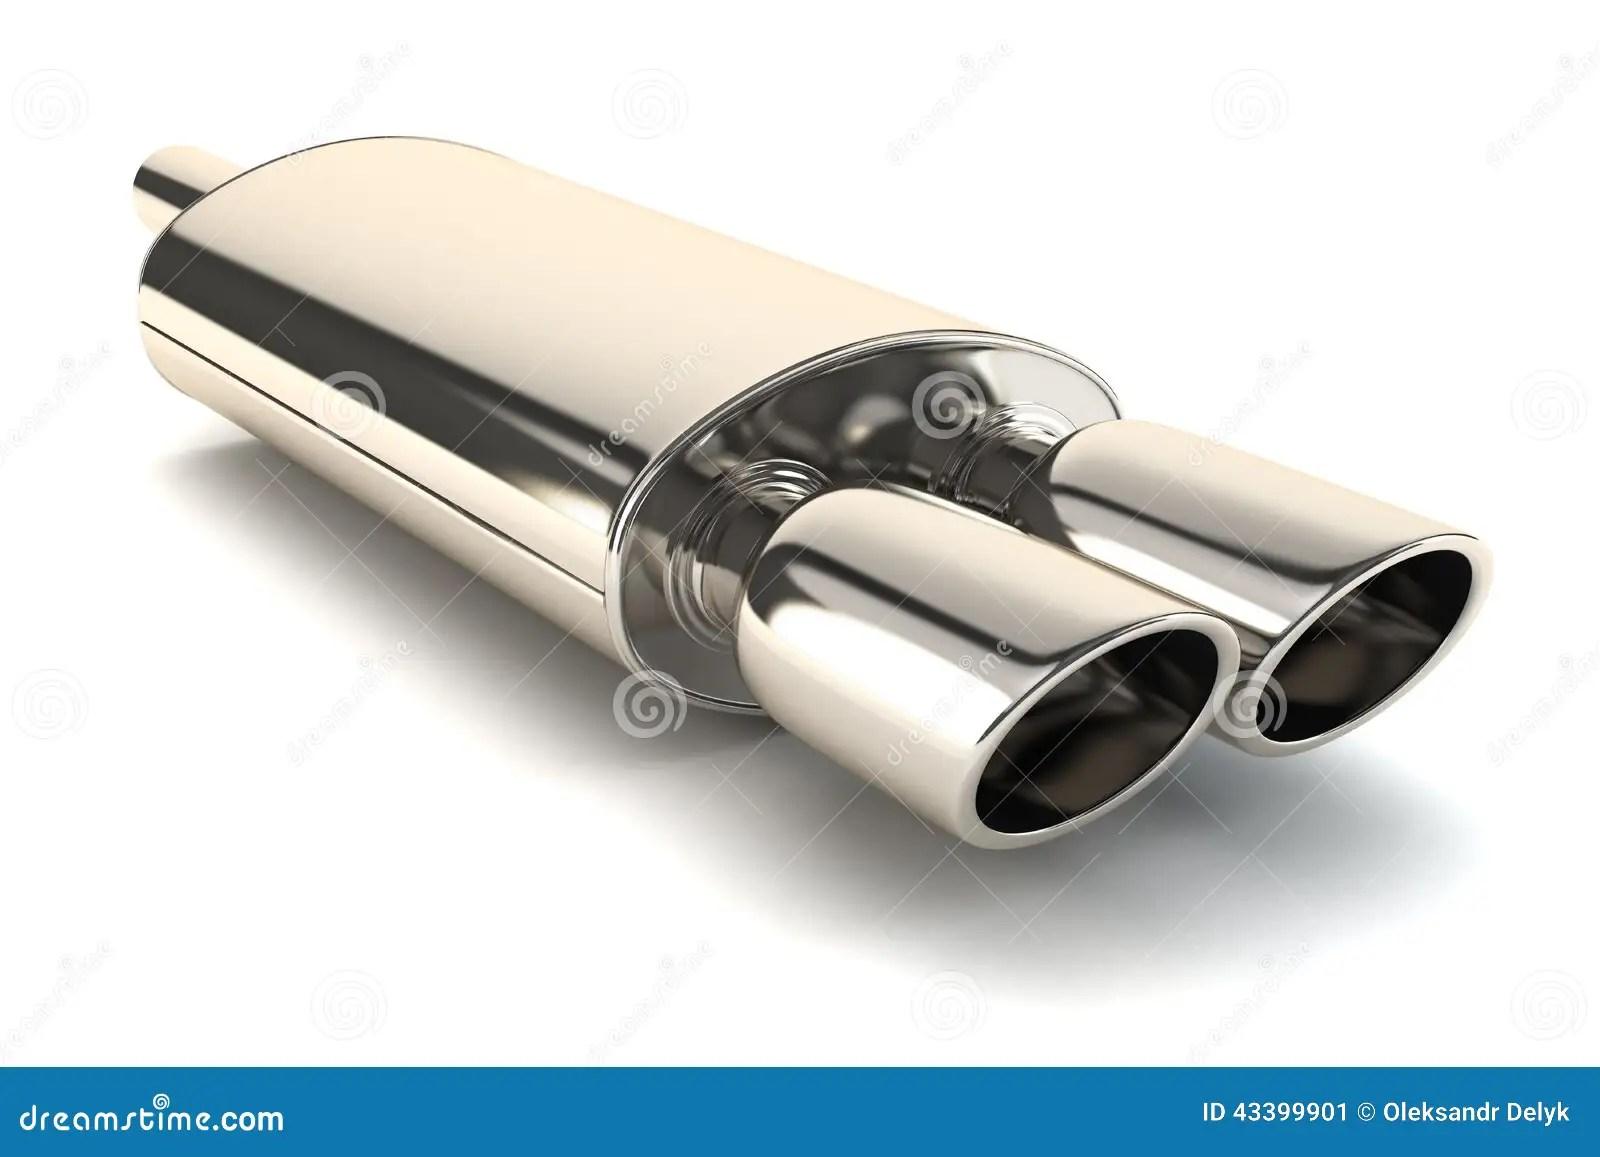 Chrome Exhaust Pipe Stock Illustration